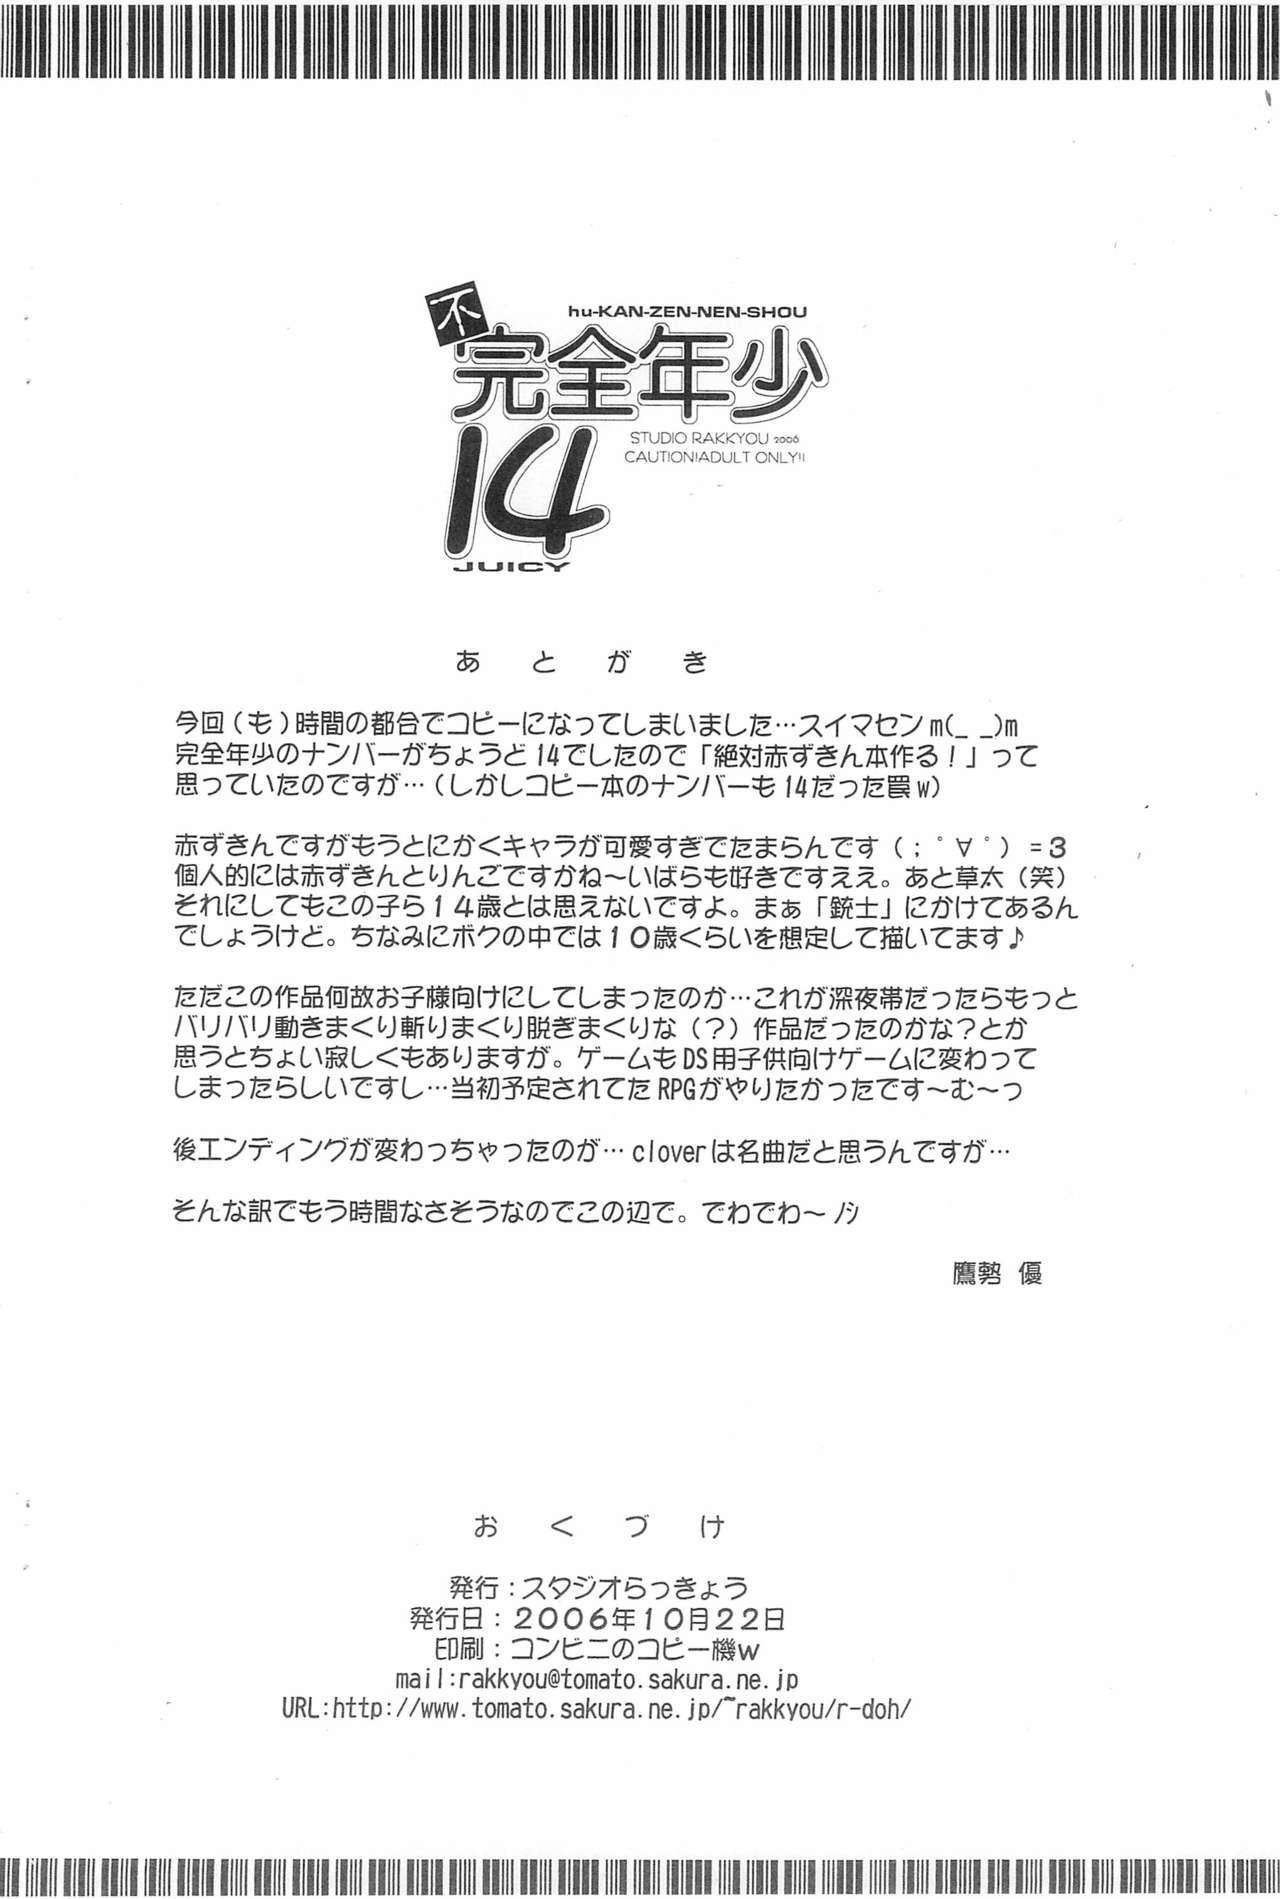 Fukanzen Nenshou 14 11